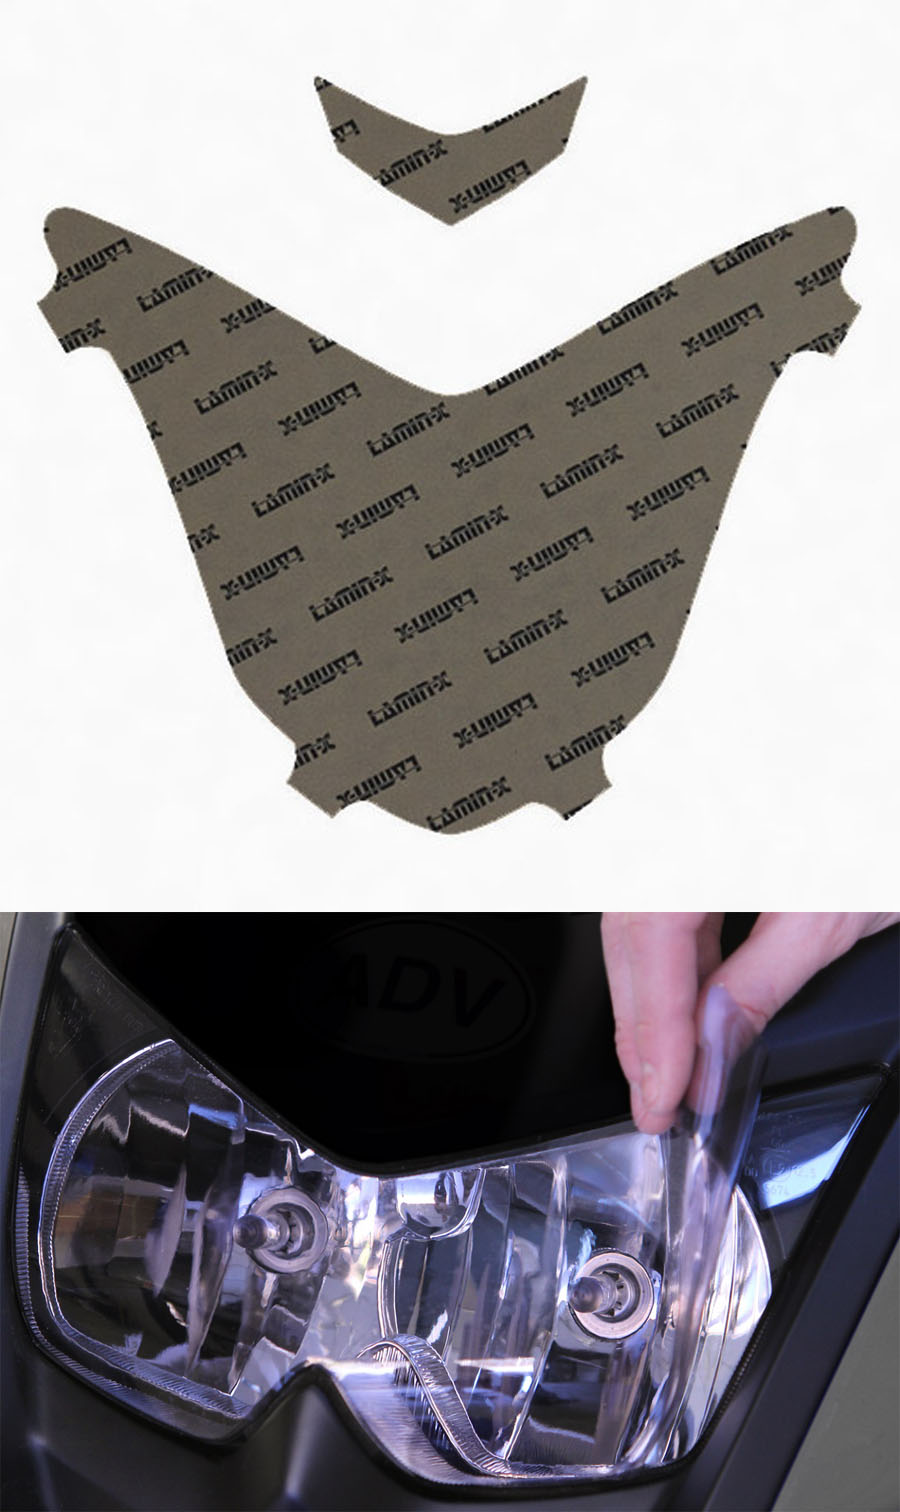 Lamin-x B505CL Headlight Cover